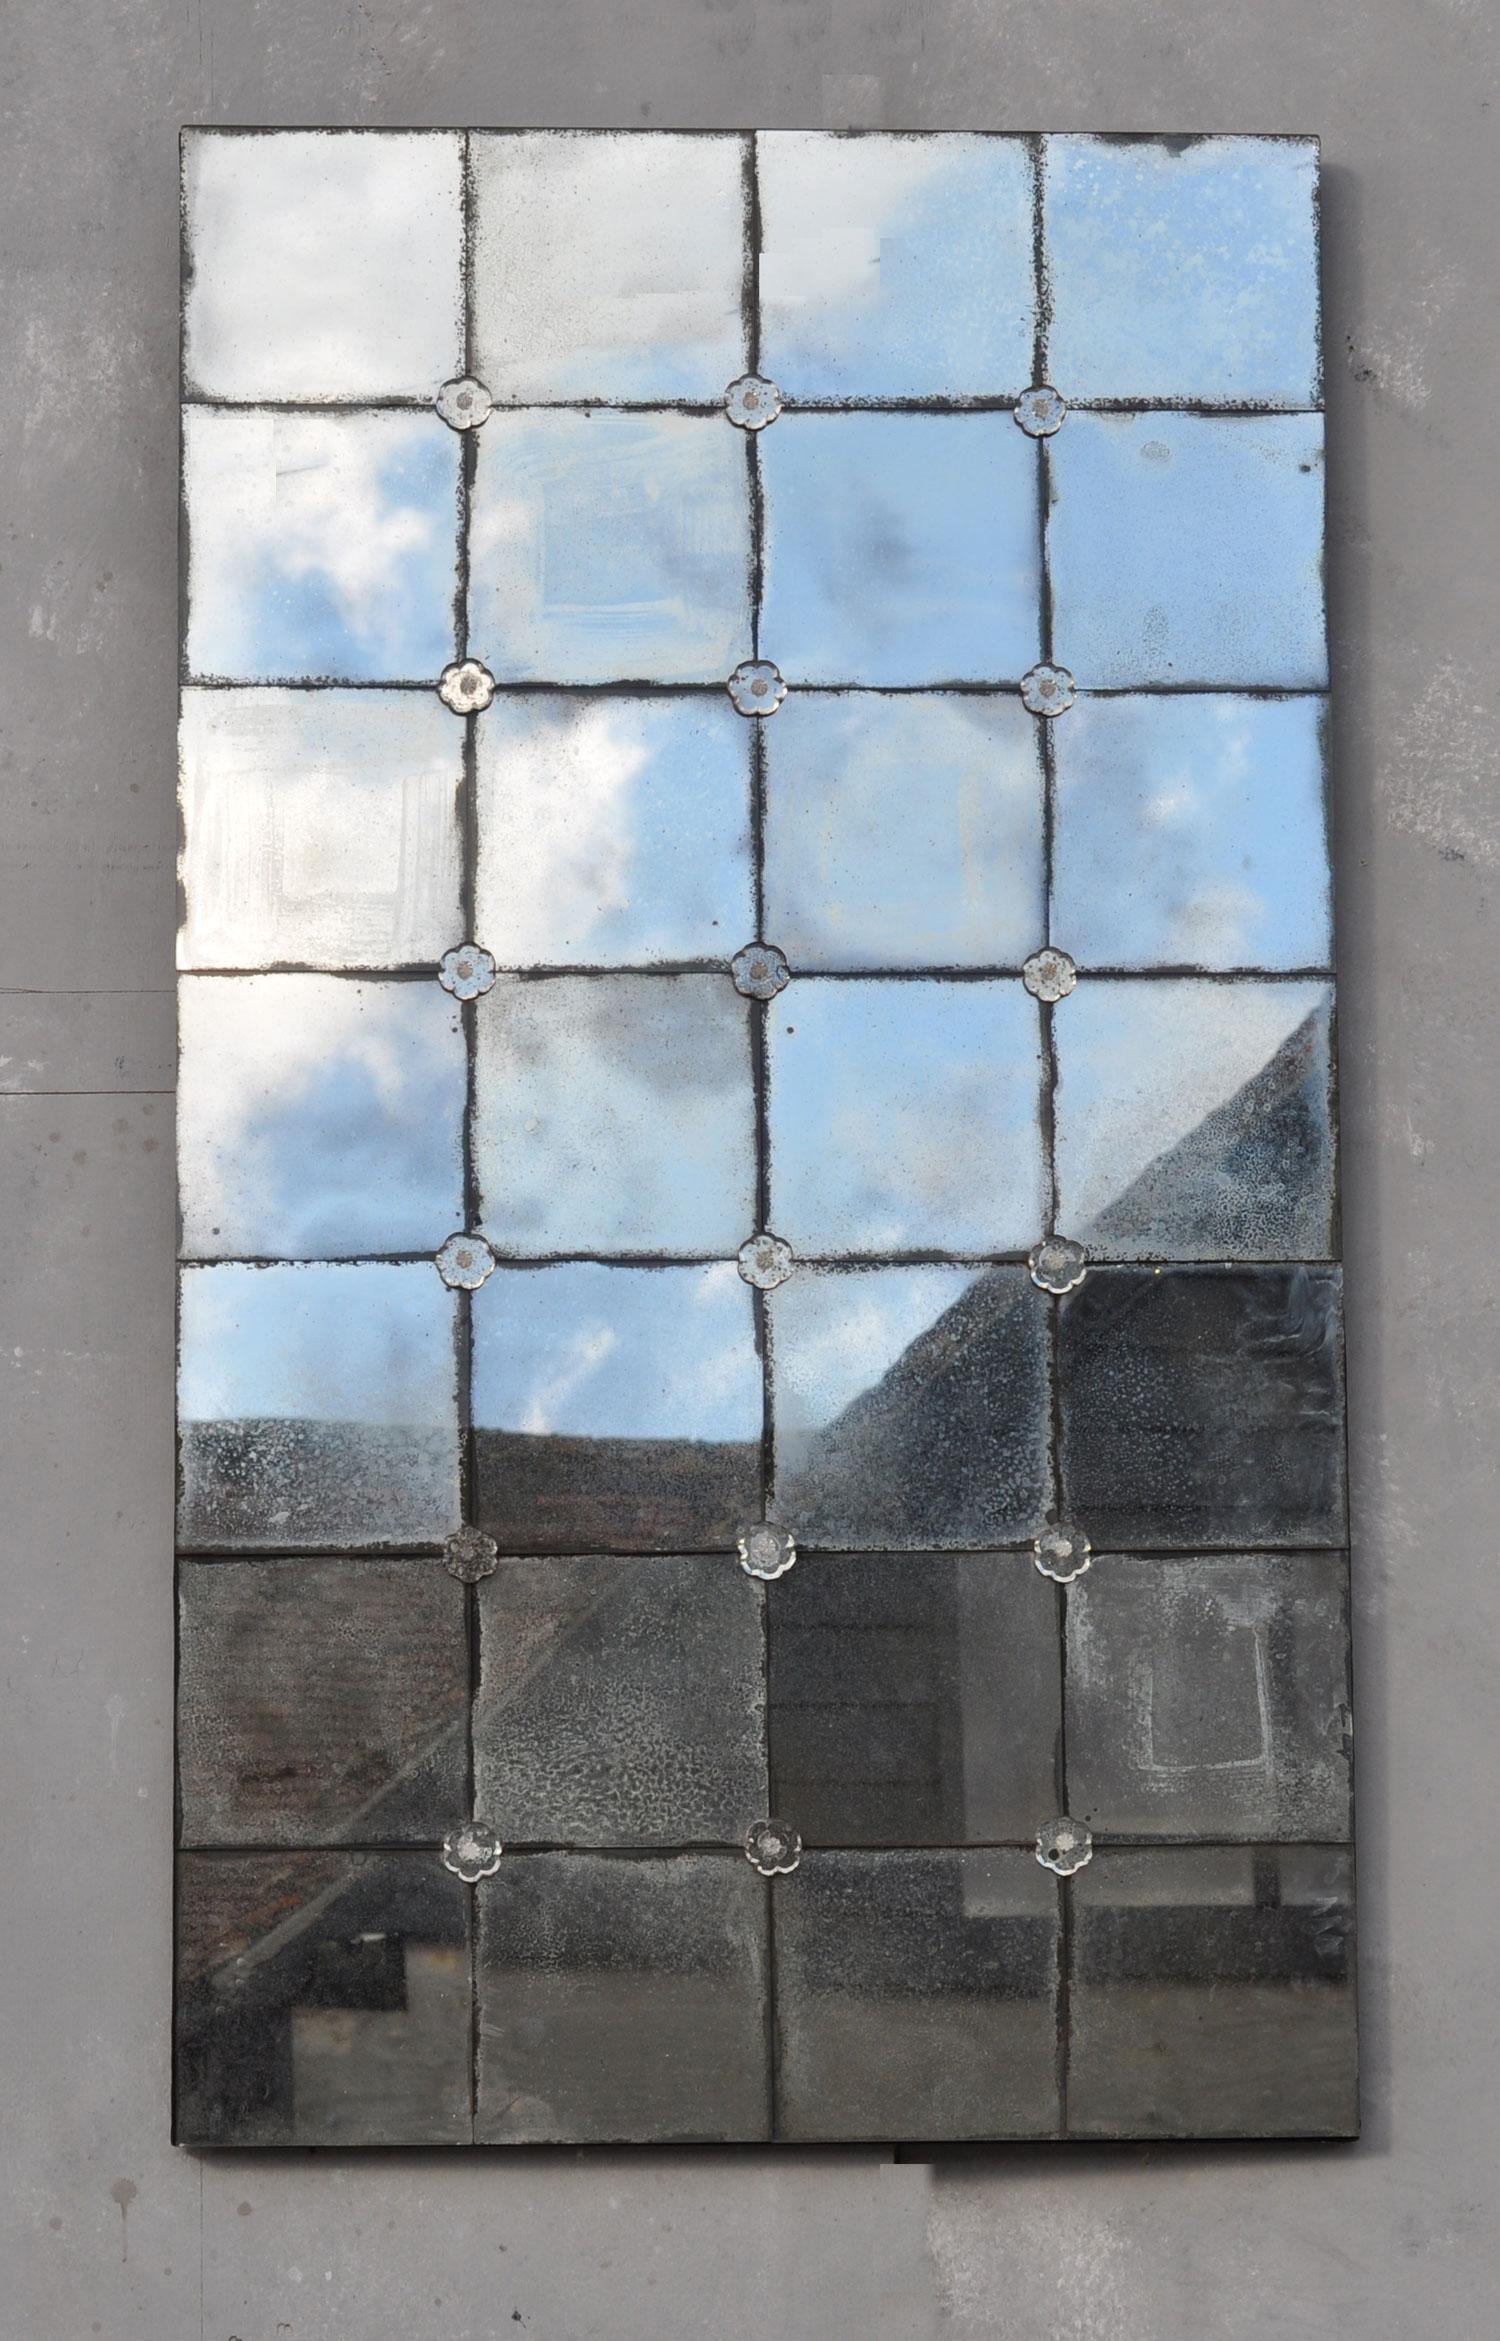 Verre Eglomise Venetian Speckled Mirror